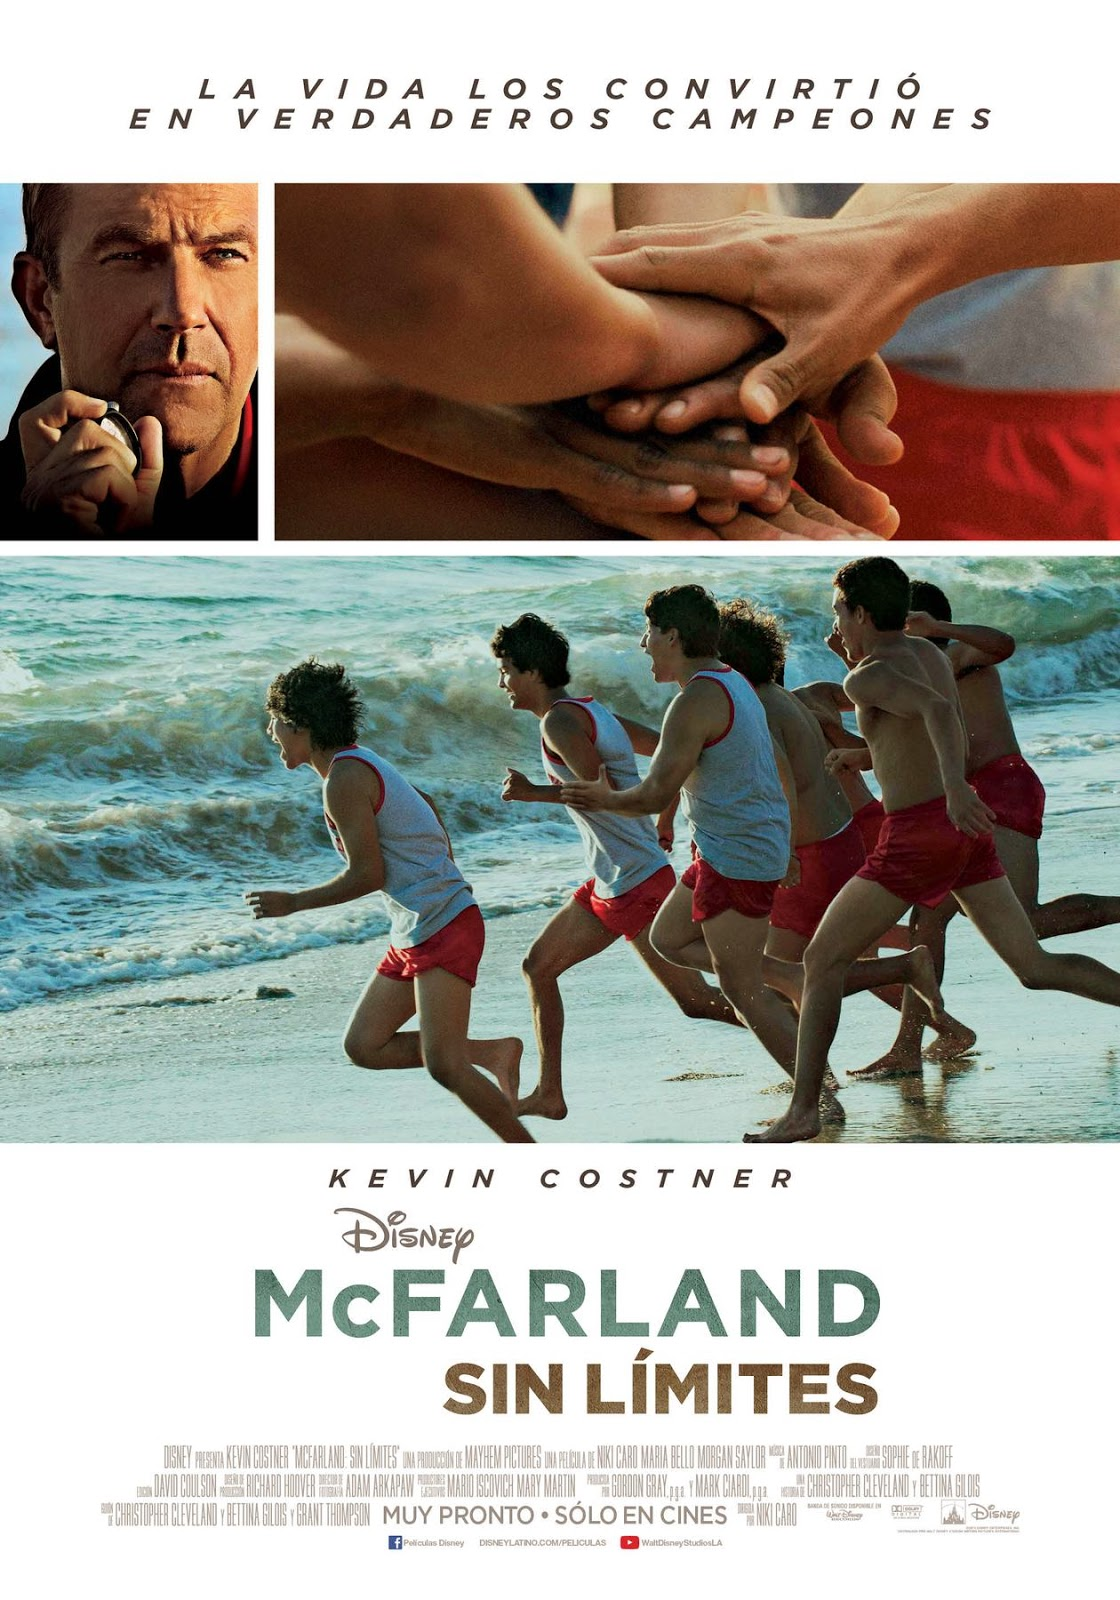 McFarland Sin Limites